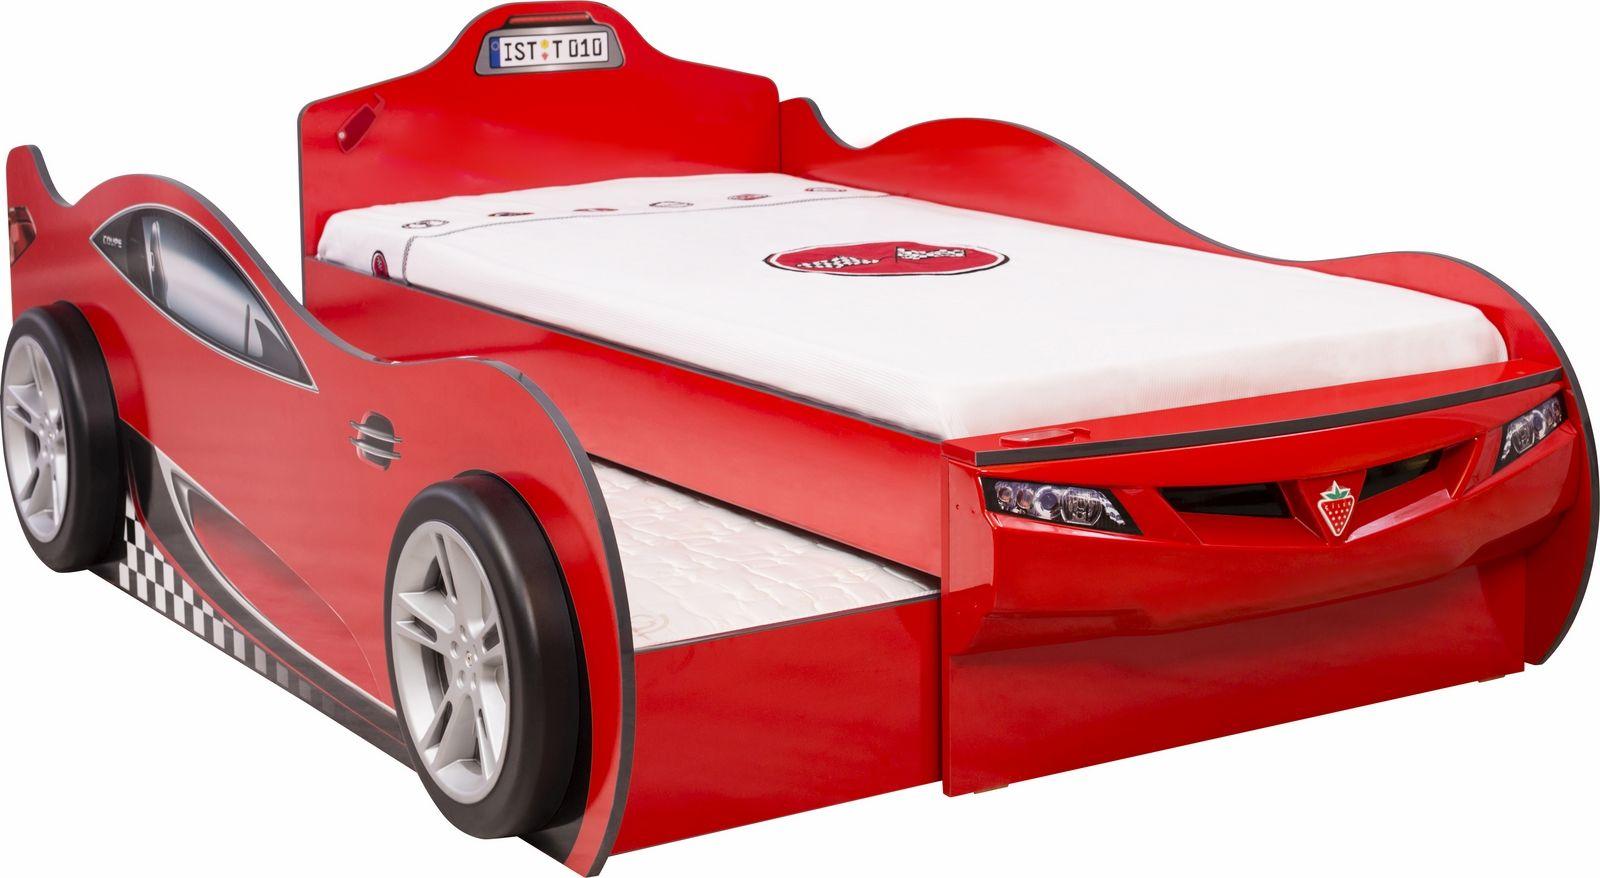 Autobett Racer double, rot | im möbel-spot kids Shop | Autobetten ...